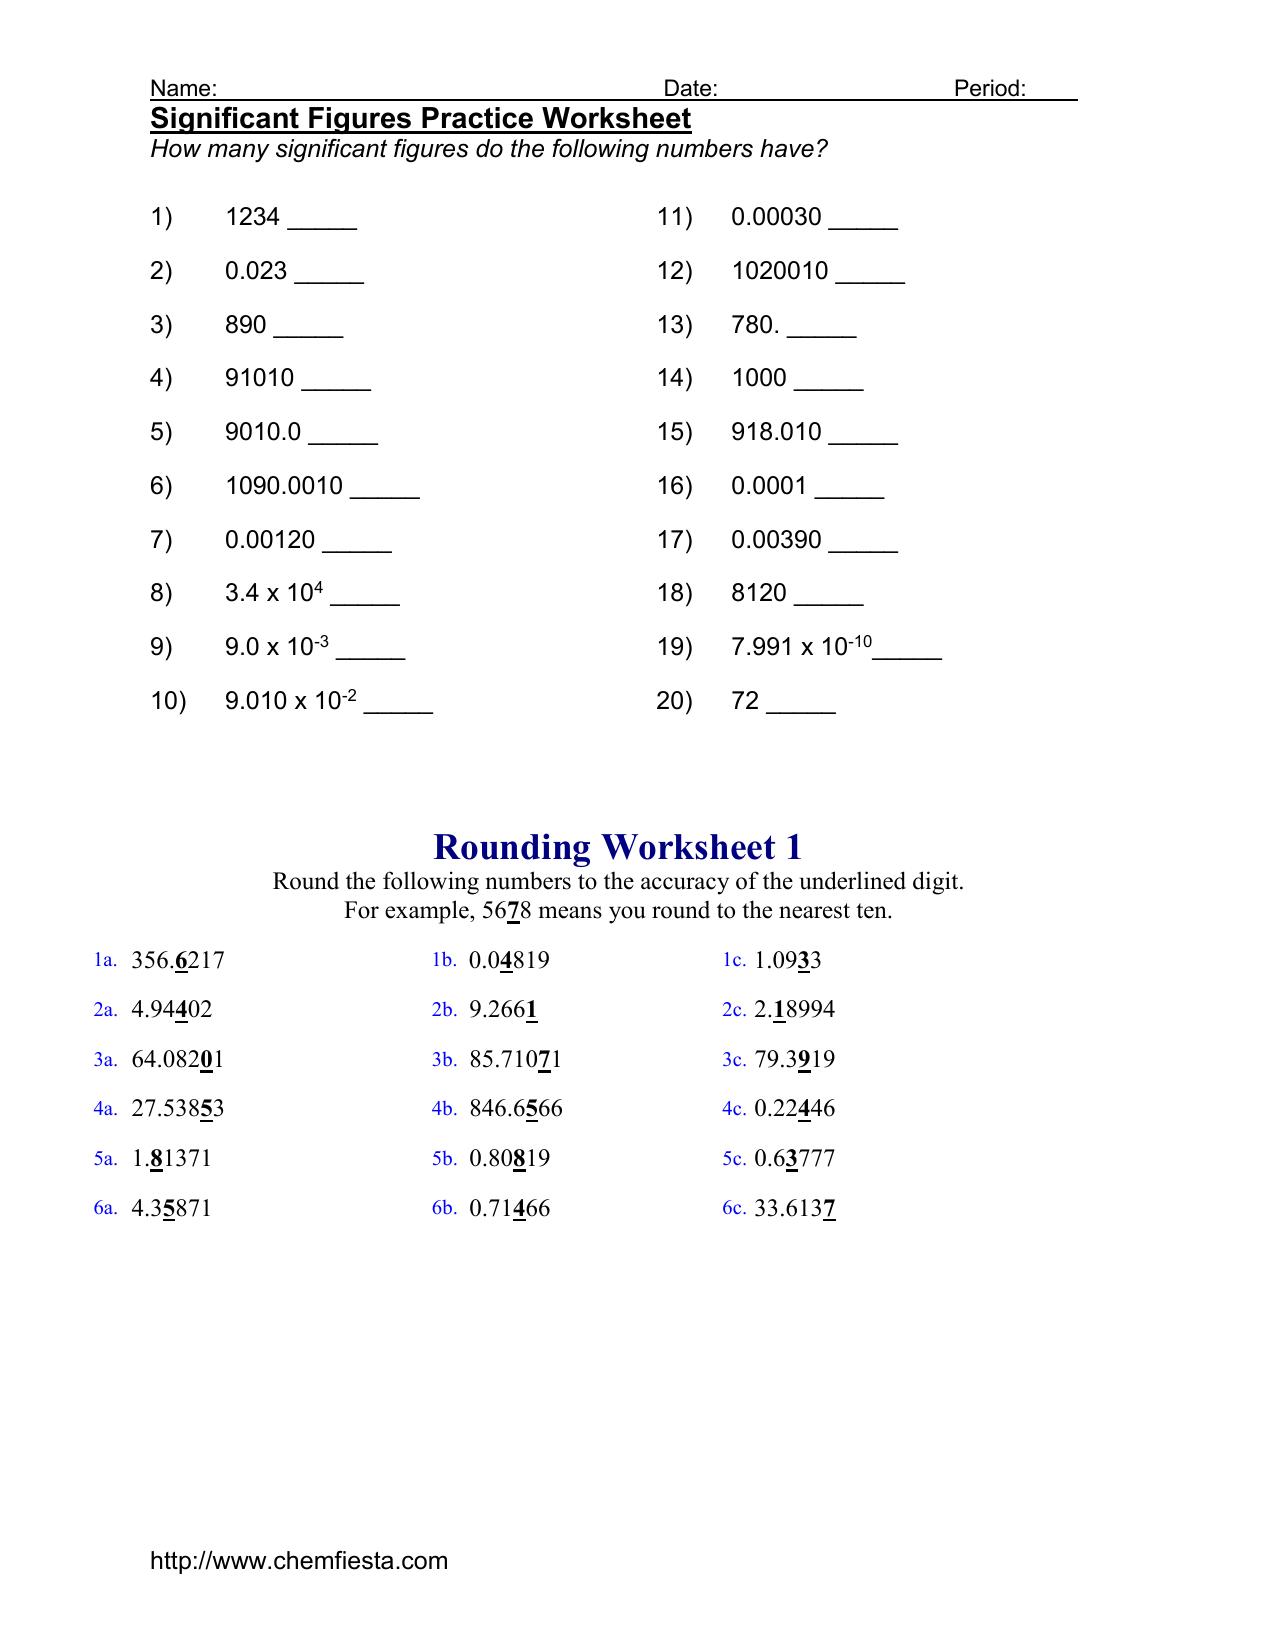 Significant Figures Practice Worksheet Intended For Significant Figures Worksheet Chemistry